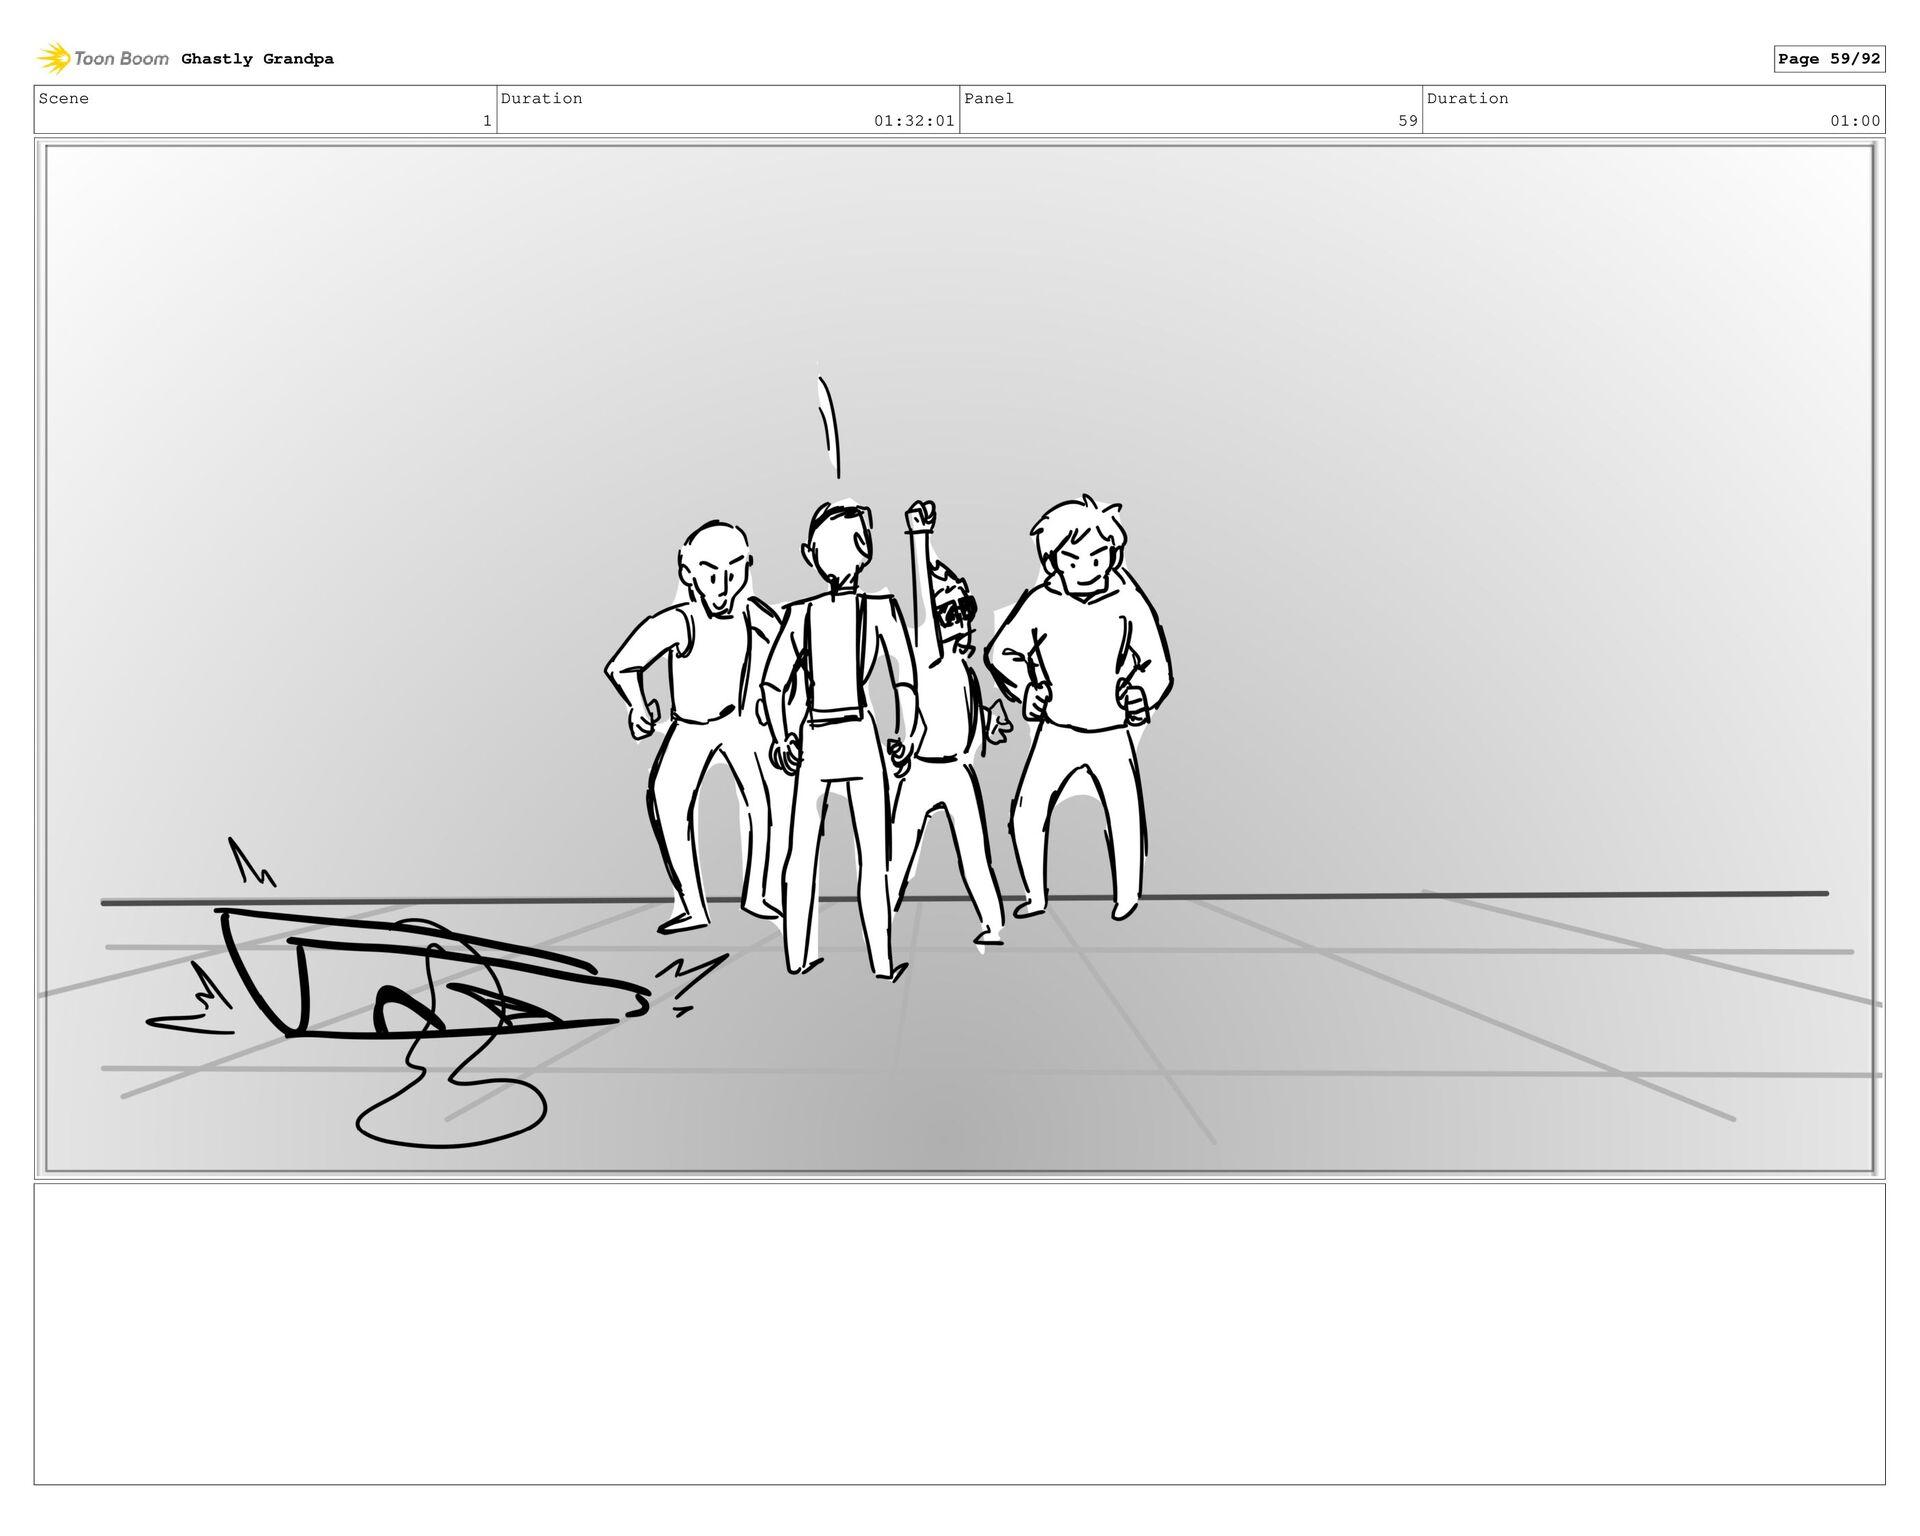 Scene 1 Duration 01:27:01 Panel 58 Duration 01:...